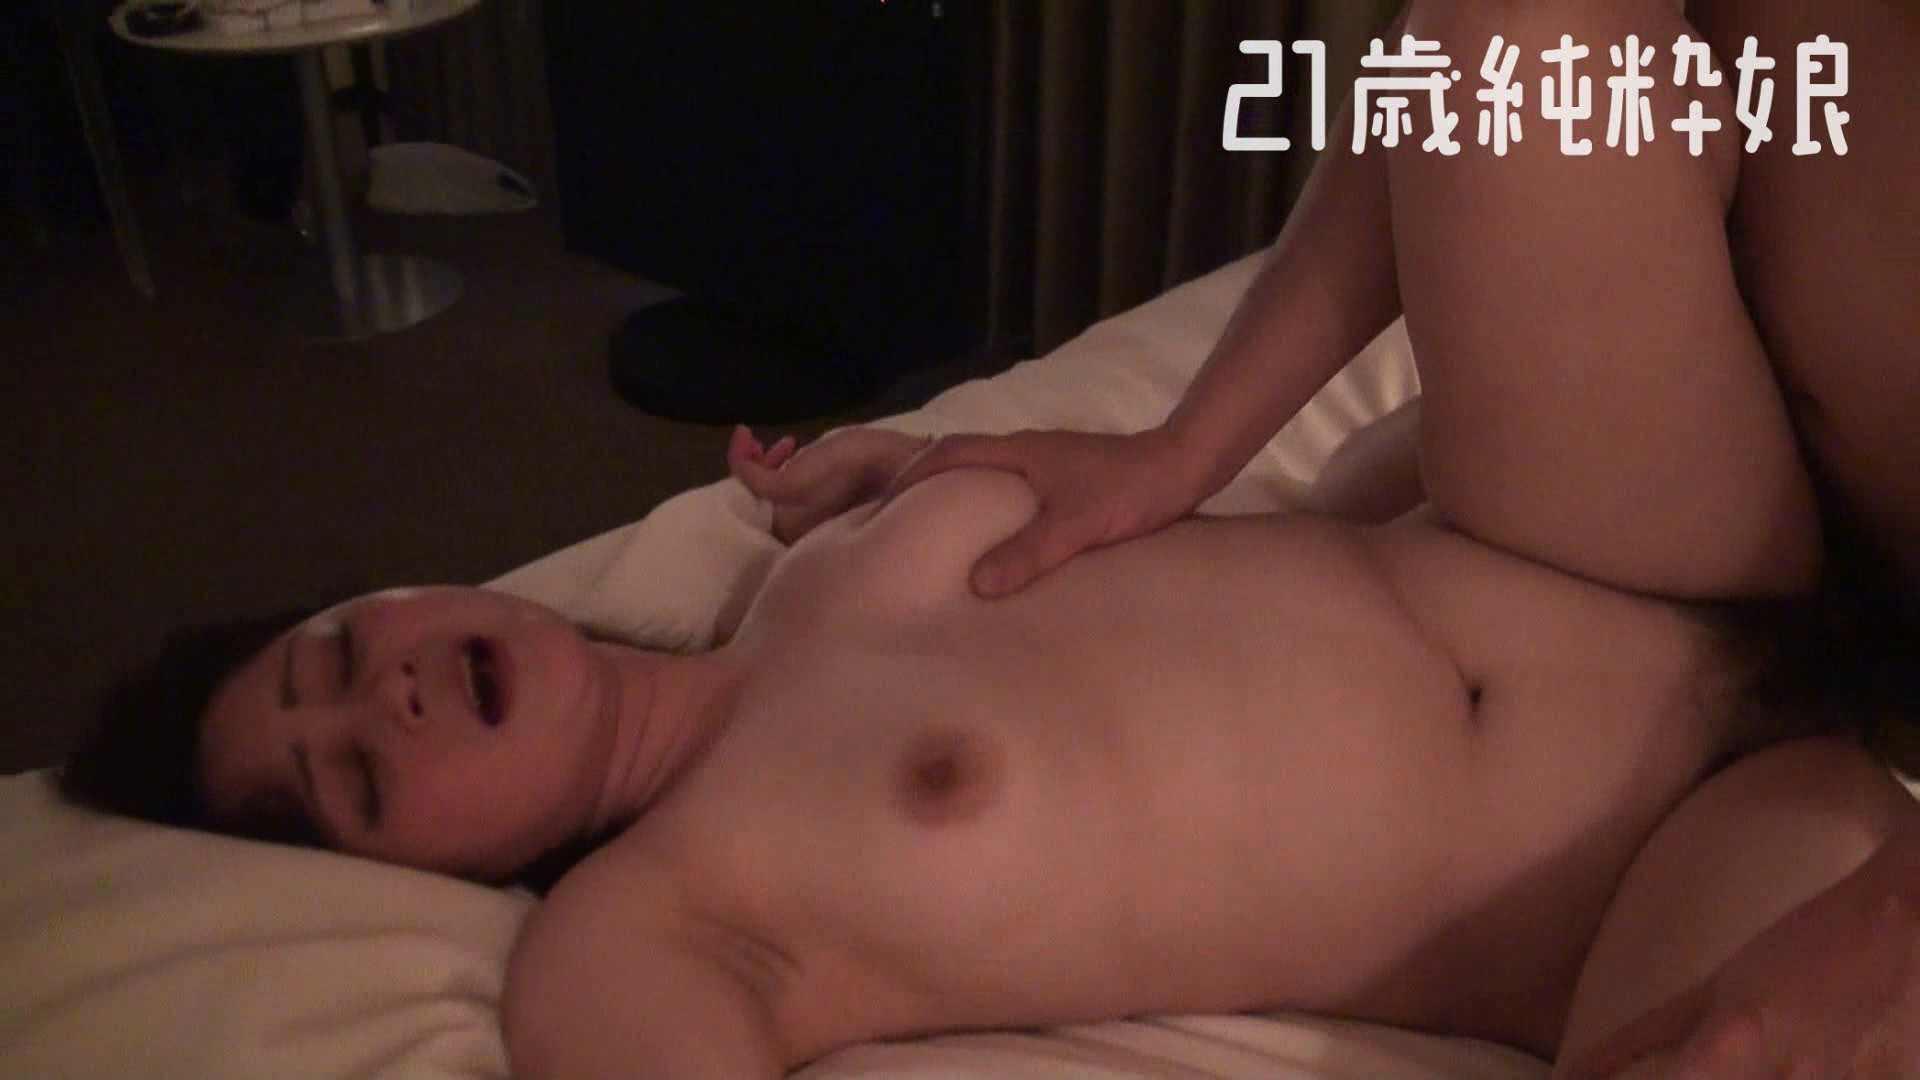 Gカップ21歳純粋嬢第2弾Vol.4 OL  82連発 69